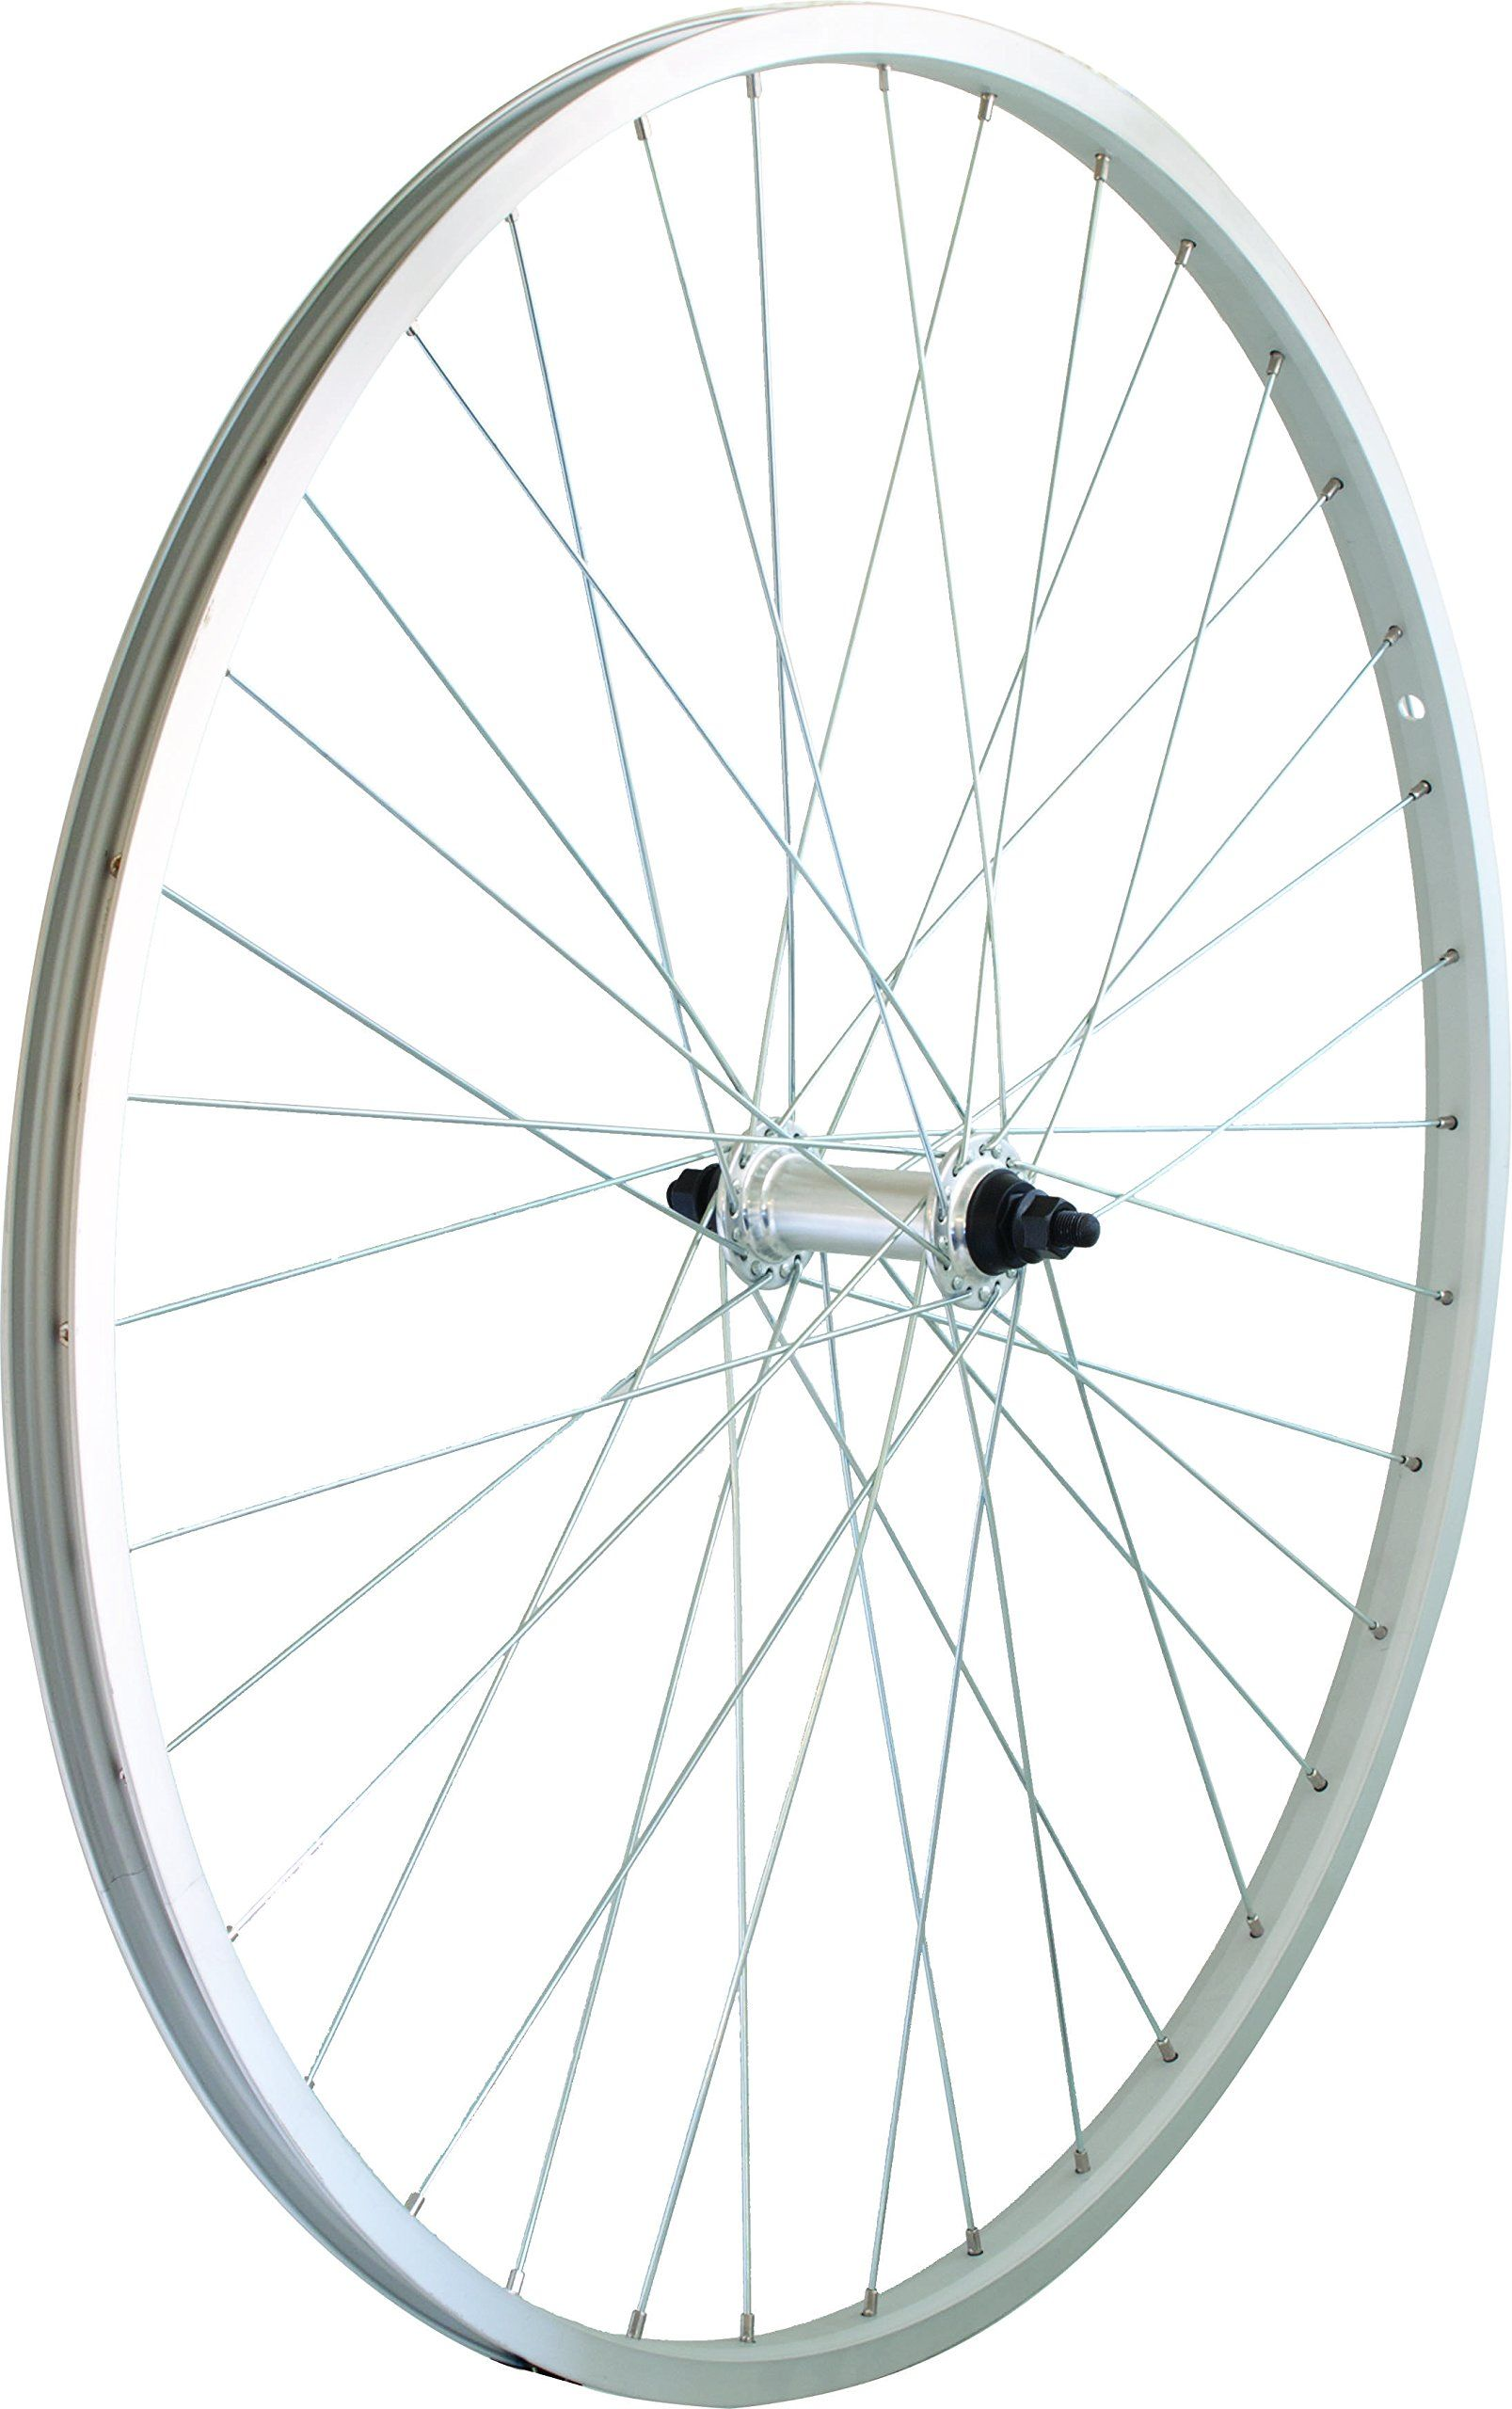 Bavel 36pcs Steel Spokes Mountain Bike Spokes MTB 281mm-295mm W//Nipples